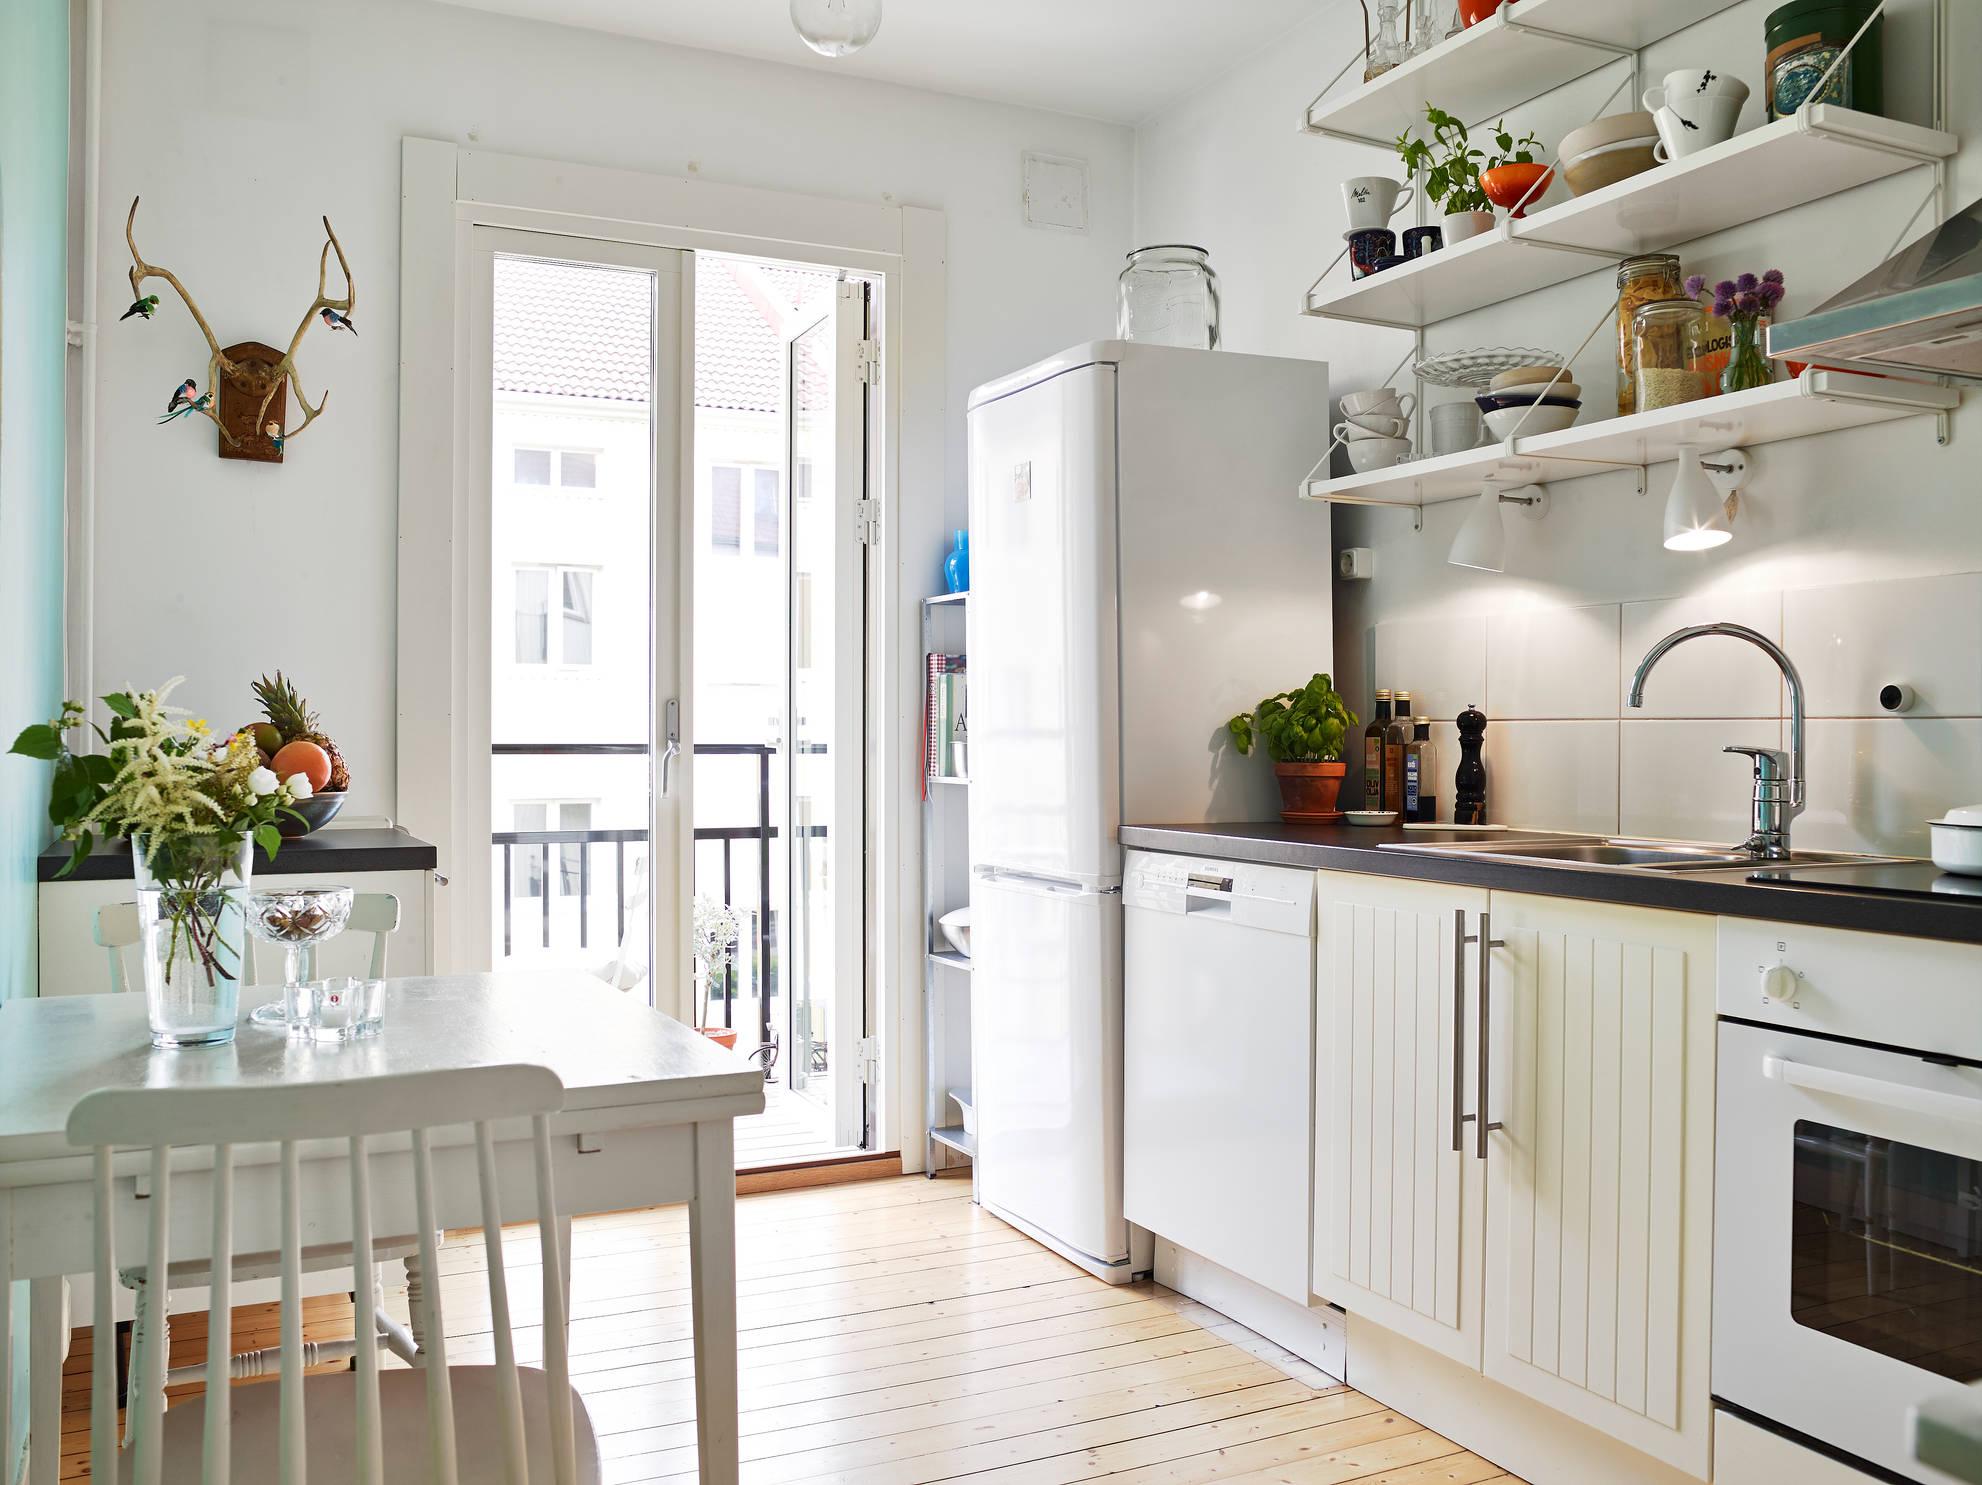 Un hogar modesto pero acogedor blog tienda decoraci n for Decoracion hogar blog